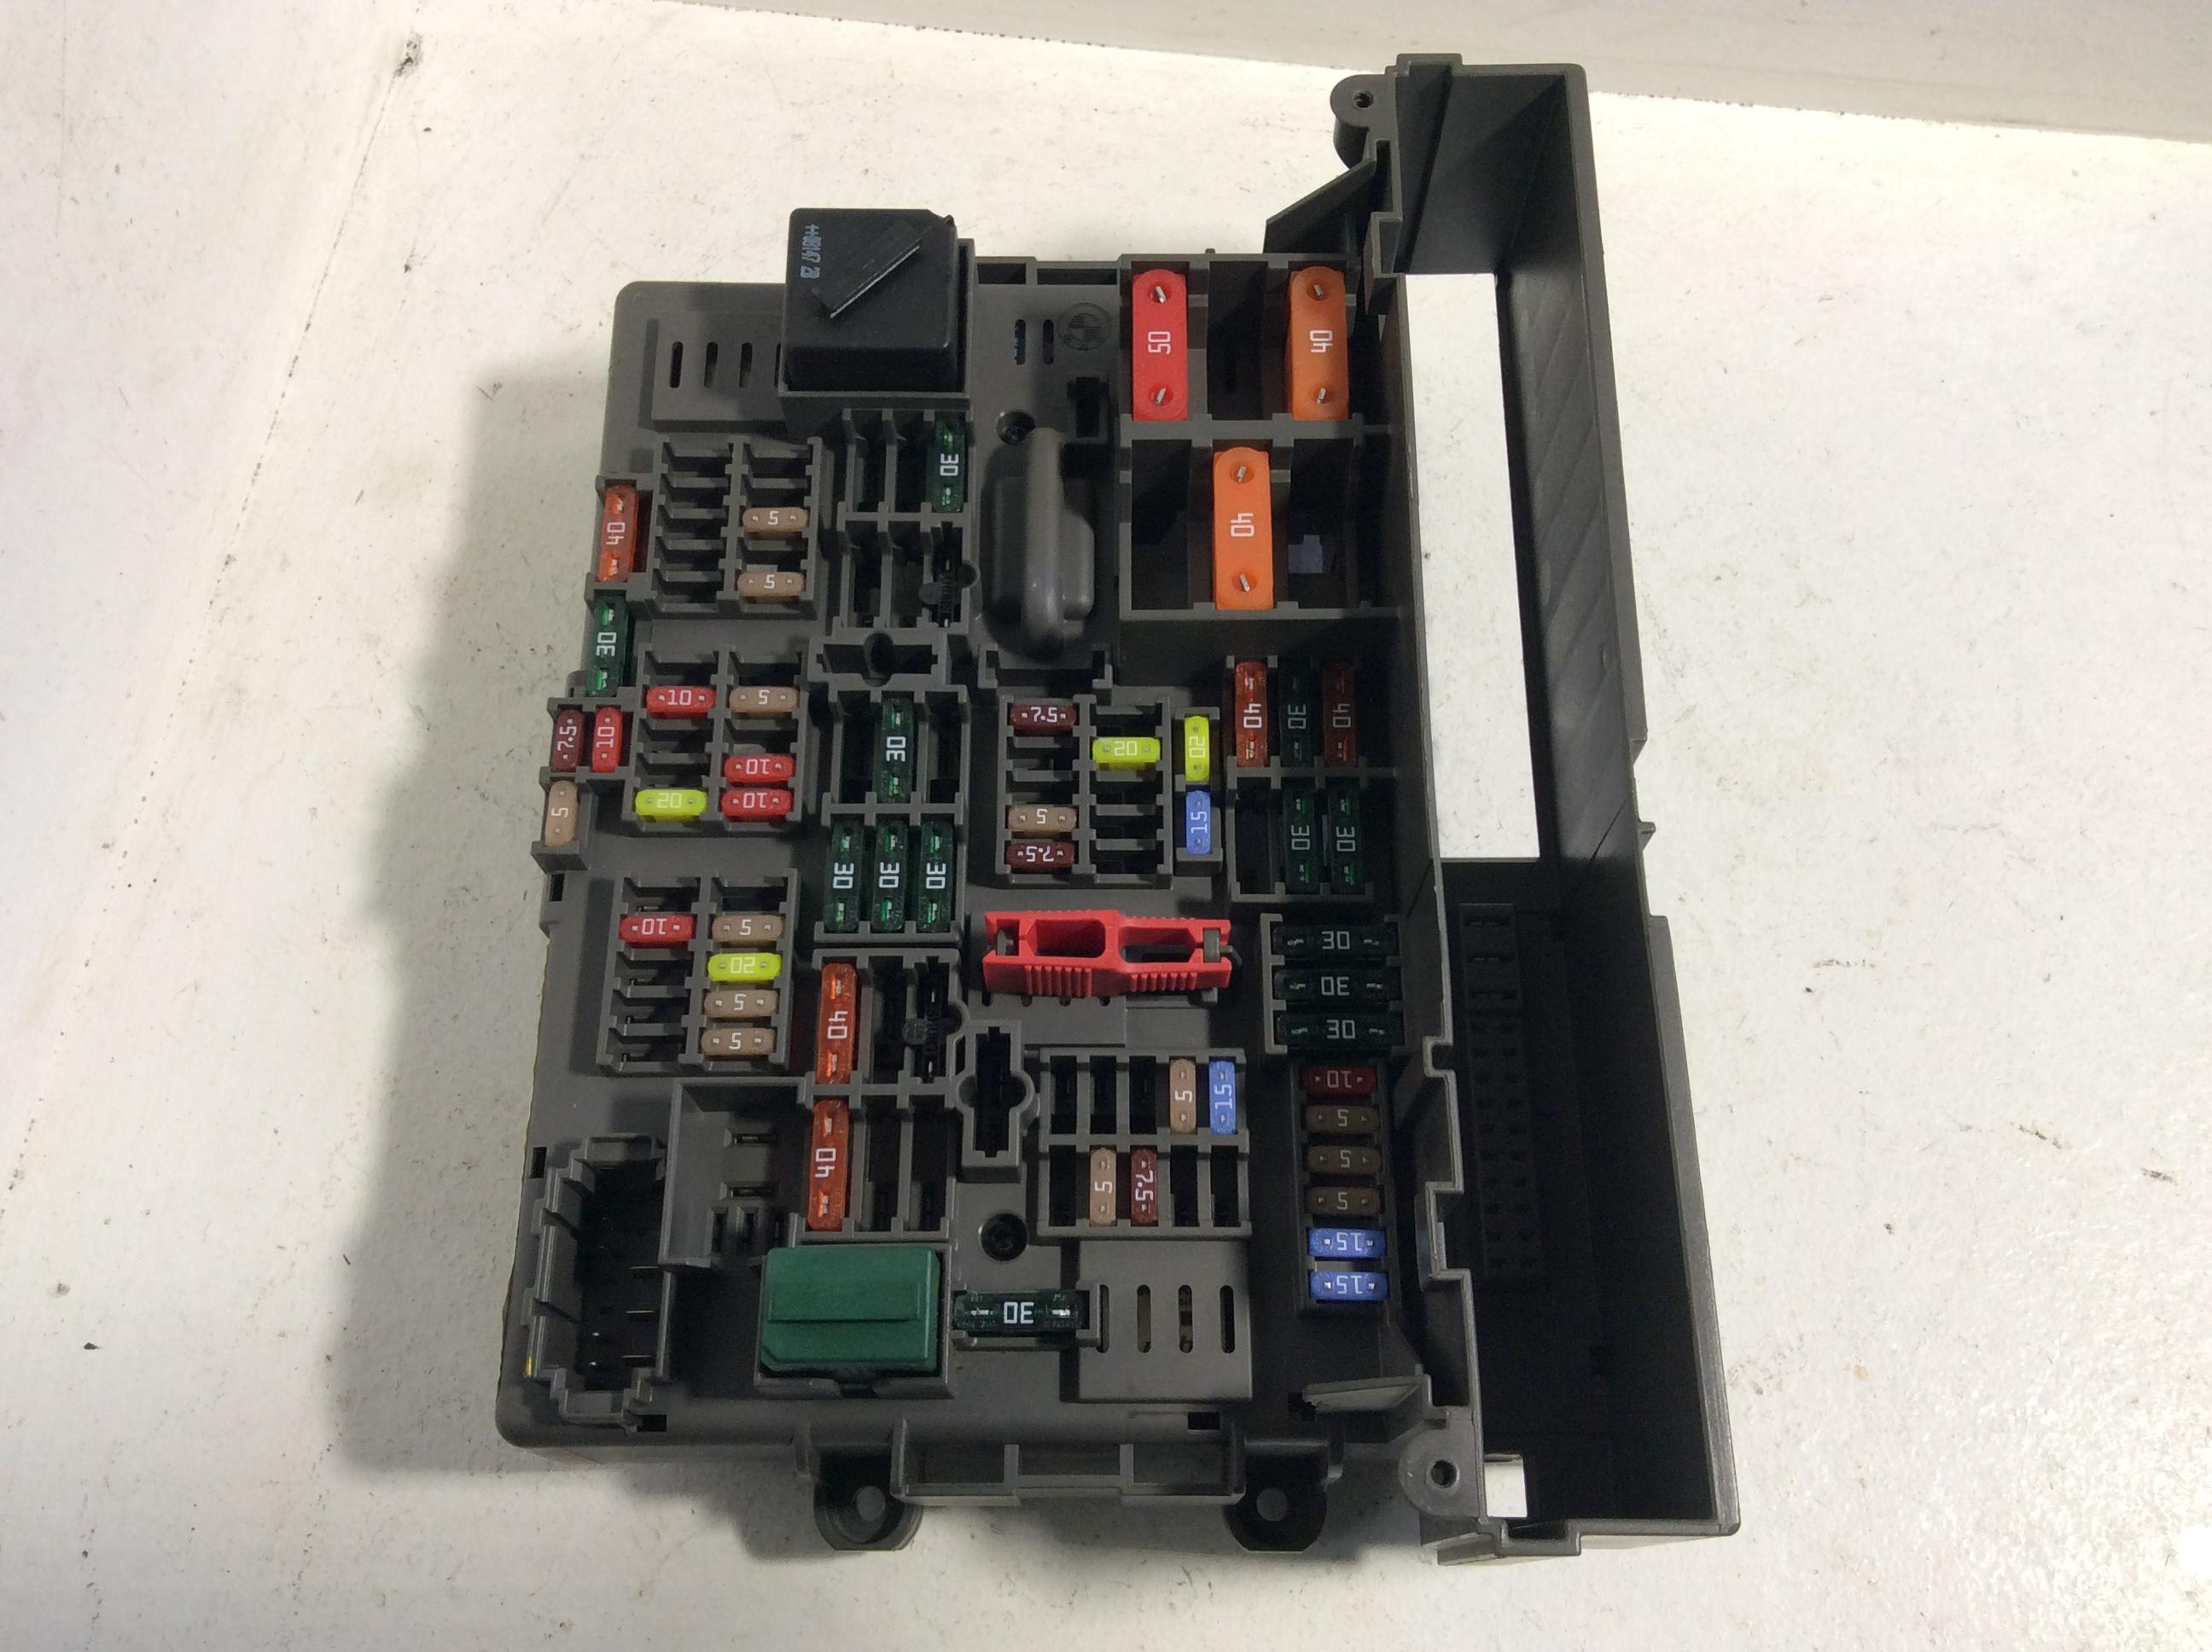 bmw e92 audio wiring diagram project management network examples fuse box html autos weblog